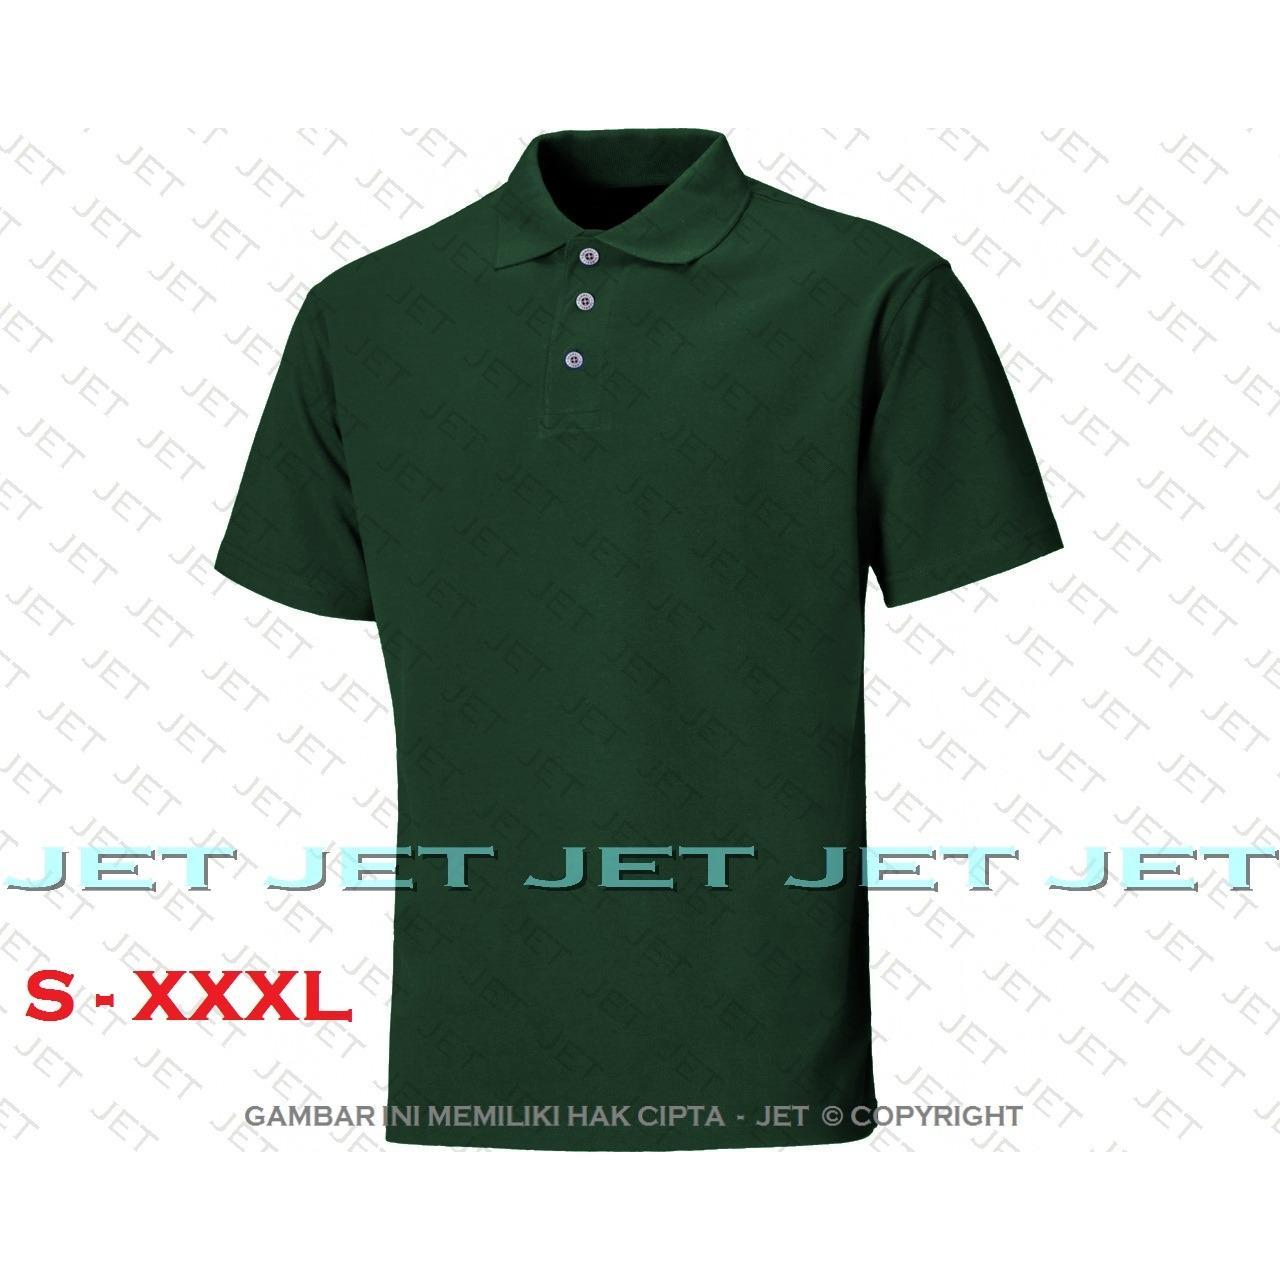 Pakaian Pria Lgs Slim Fit Kaos Polo Motif Simpel Logo Biru Xl